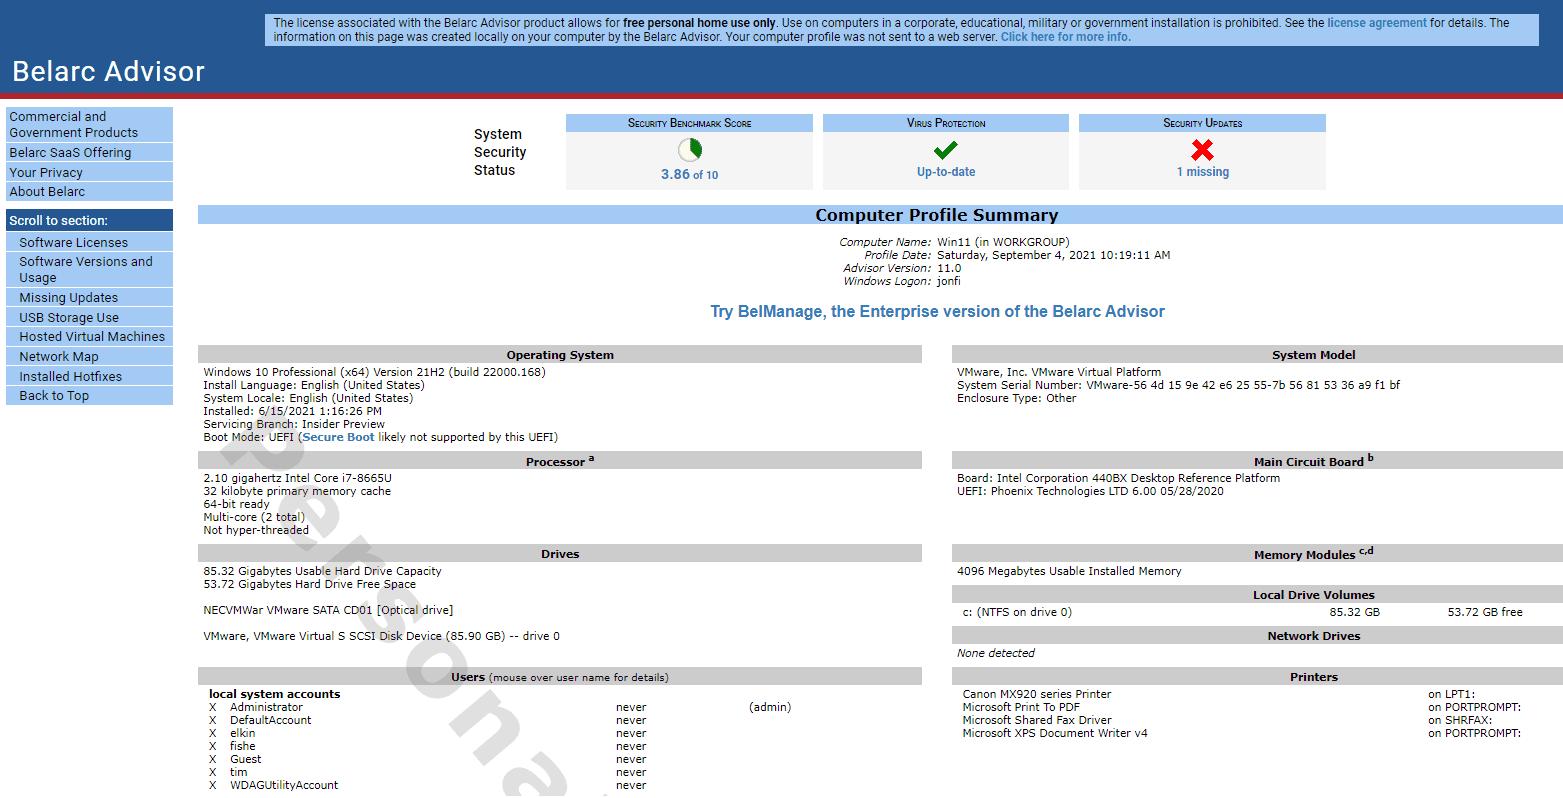 Belarc Advisor summary page